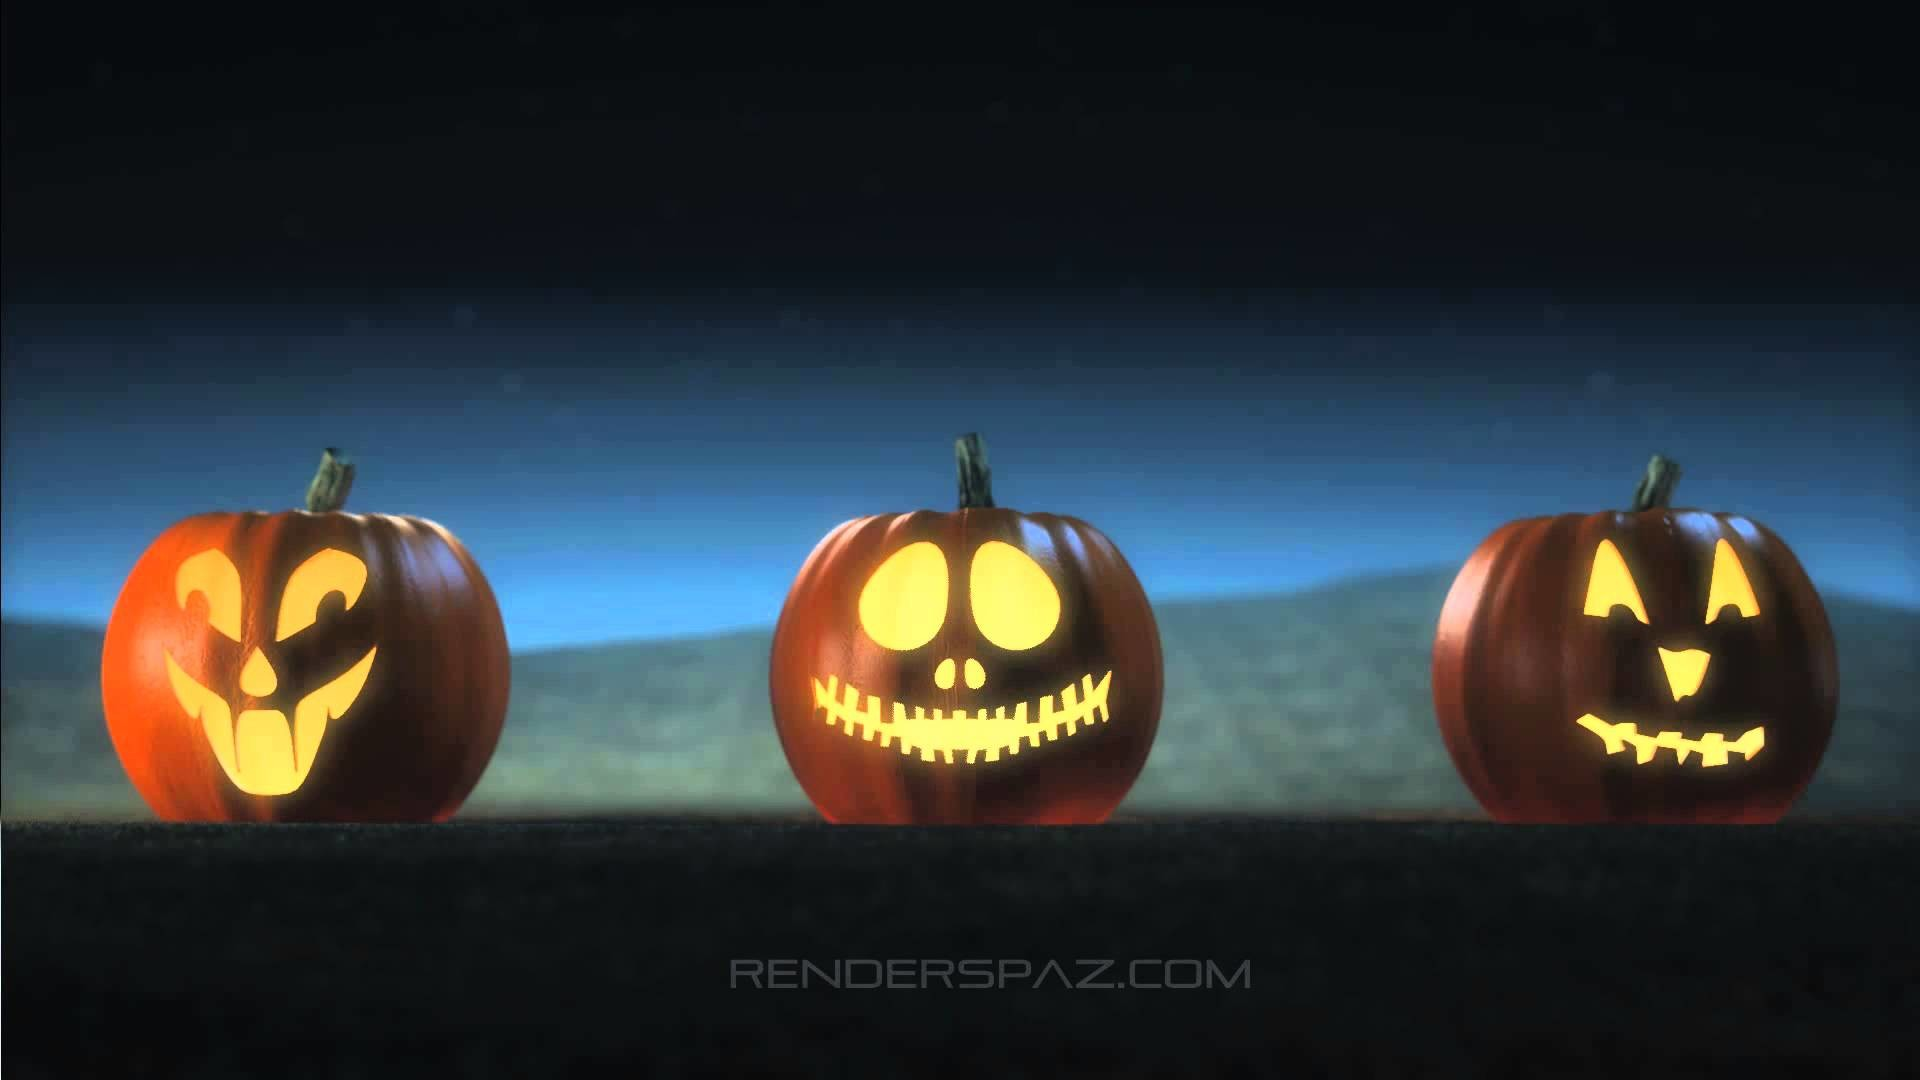 animated jack o lantern wallpaper (75+ images)